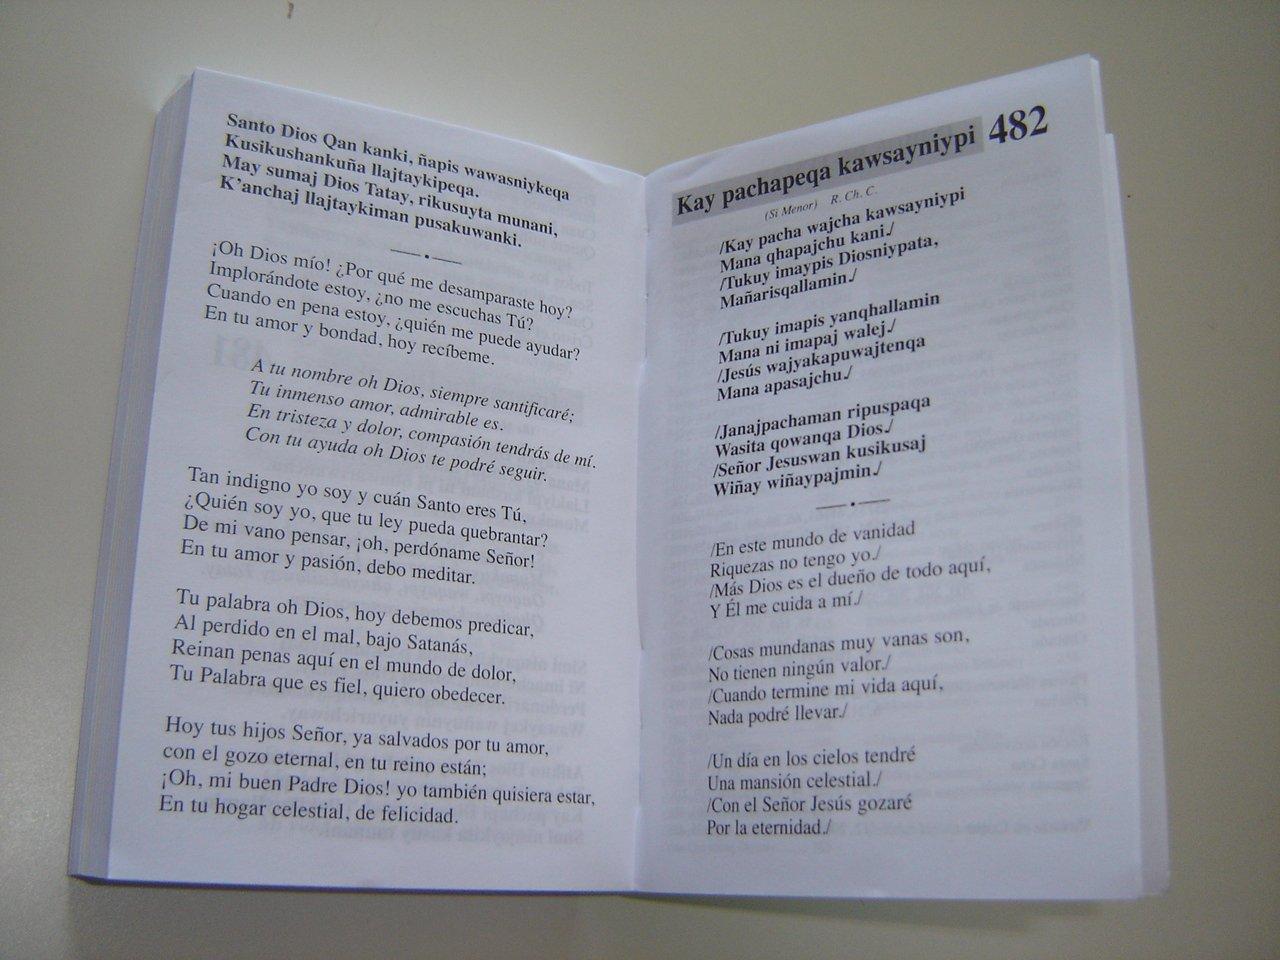 Bolivian Christian Songbook with 500 Songs / BILINGUAL QUECHUA - SPANISH version / Kusiywan Diosman Takinachej / Iskay Nan - Dos Caminos (Kay cuadroj ...